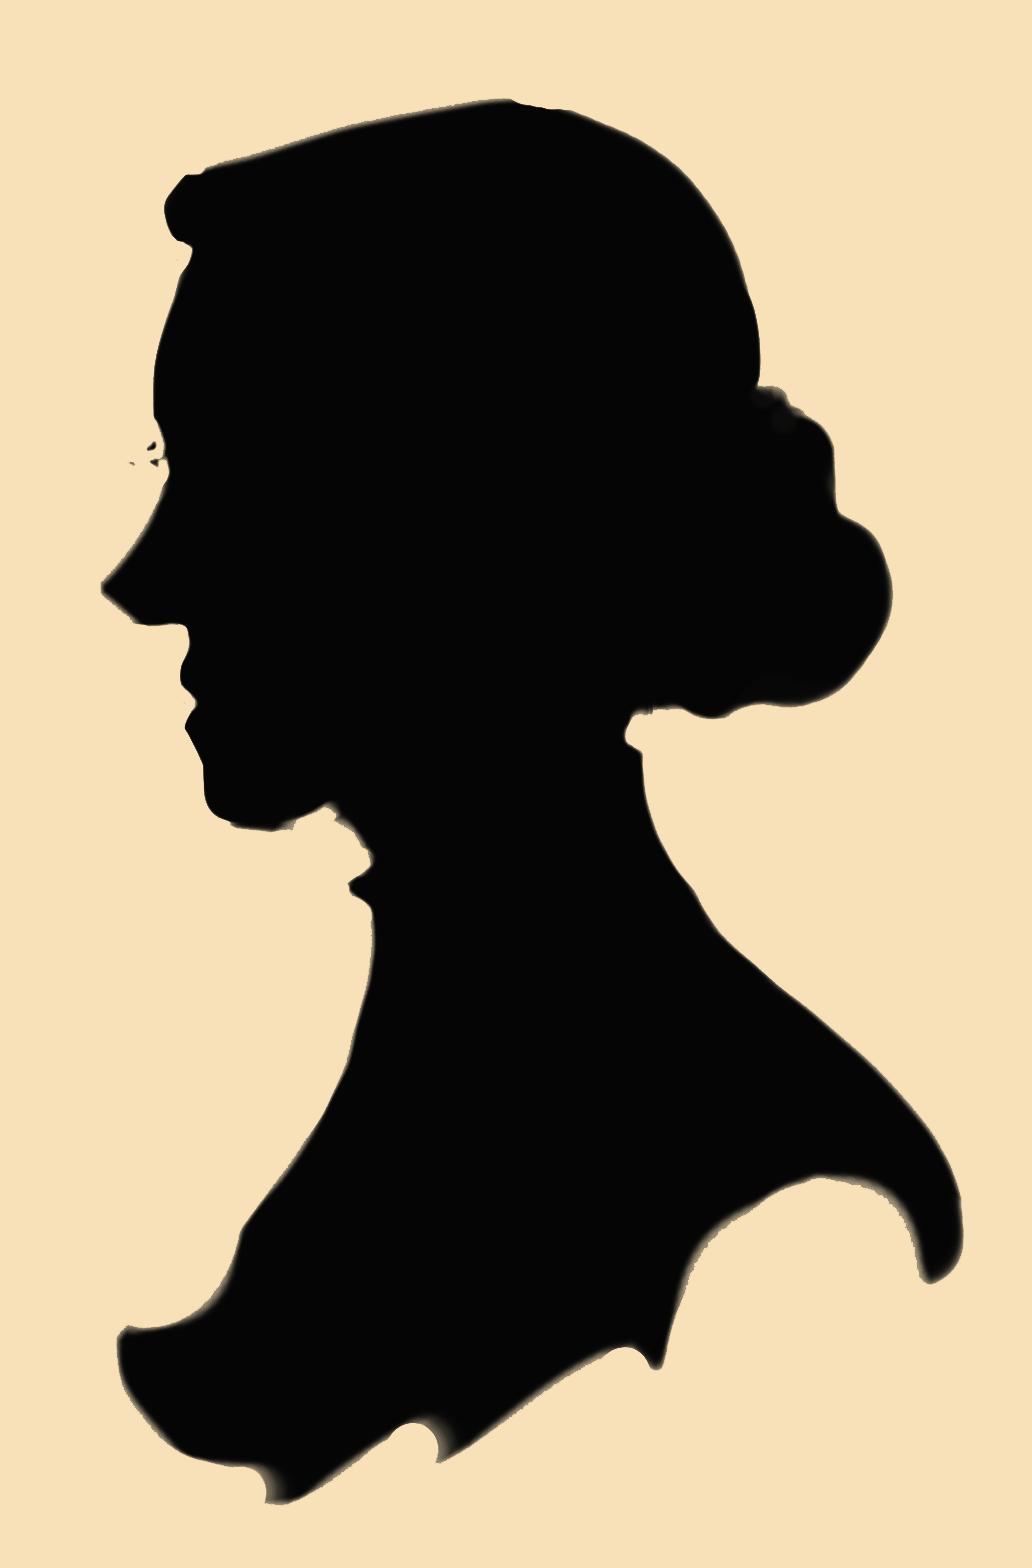 Abigail Cullen